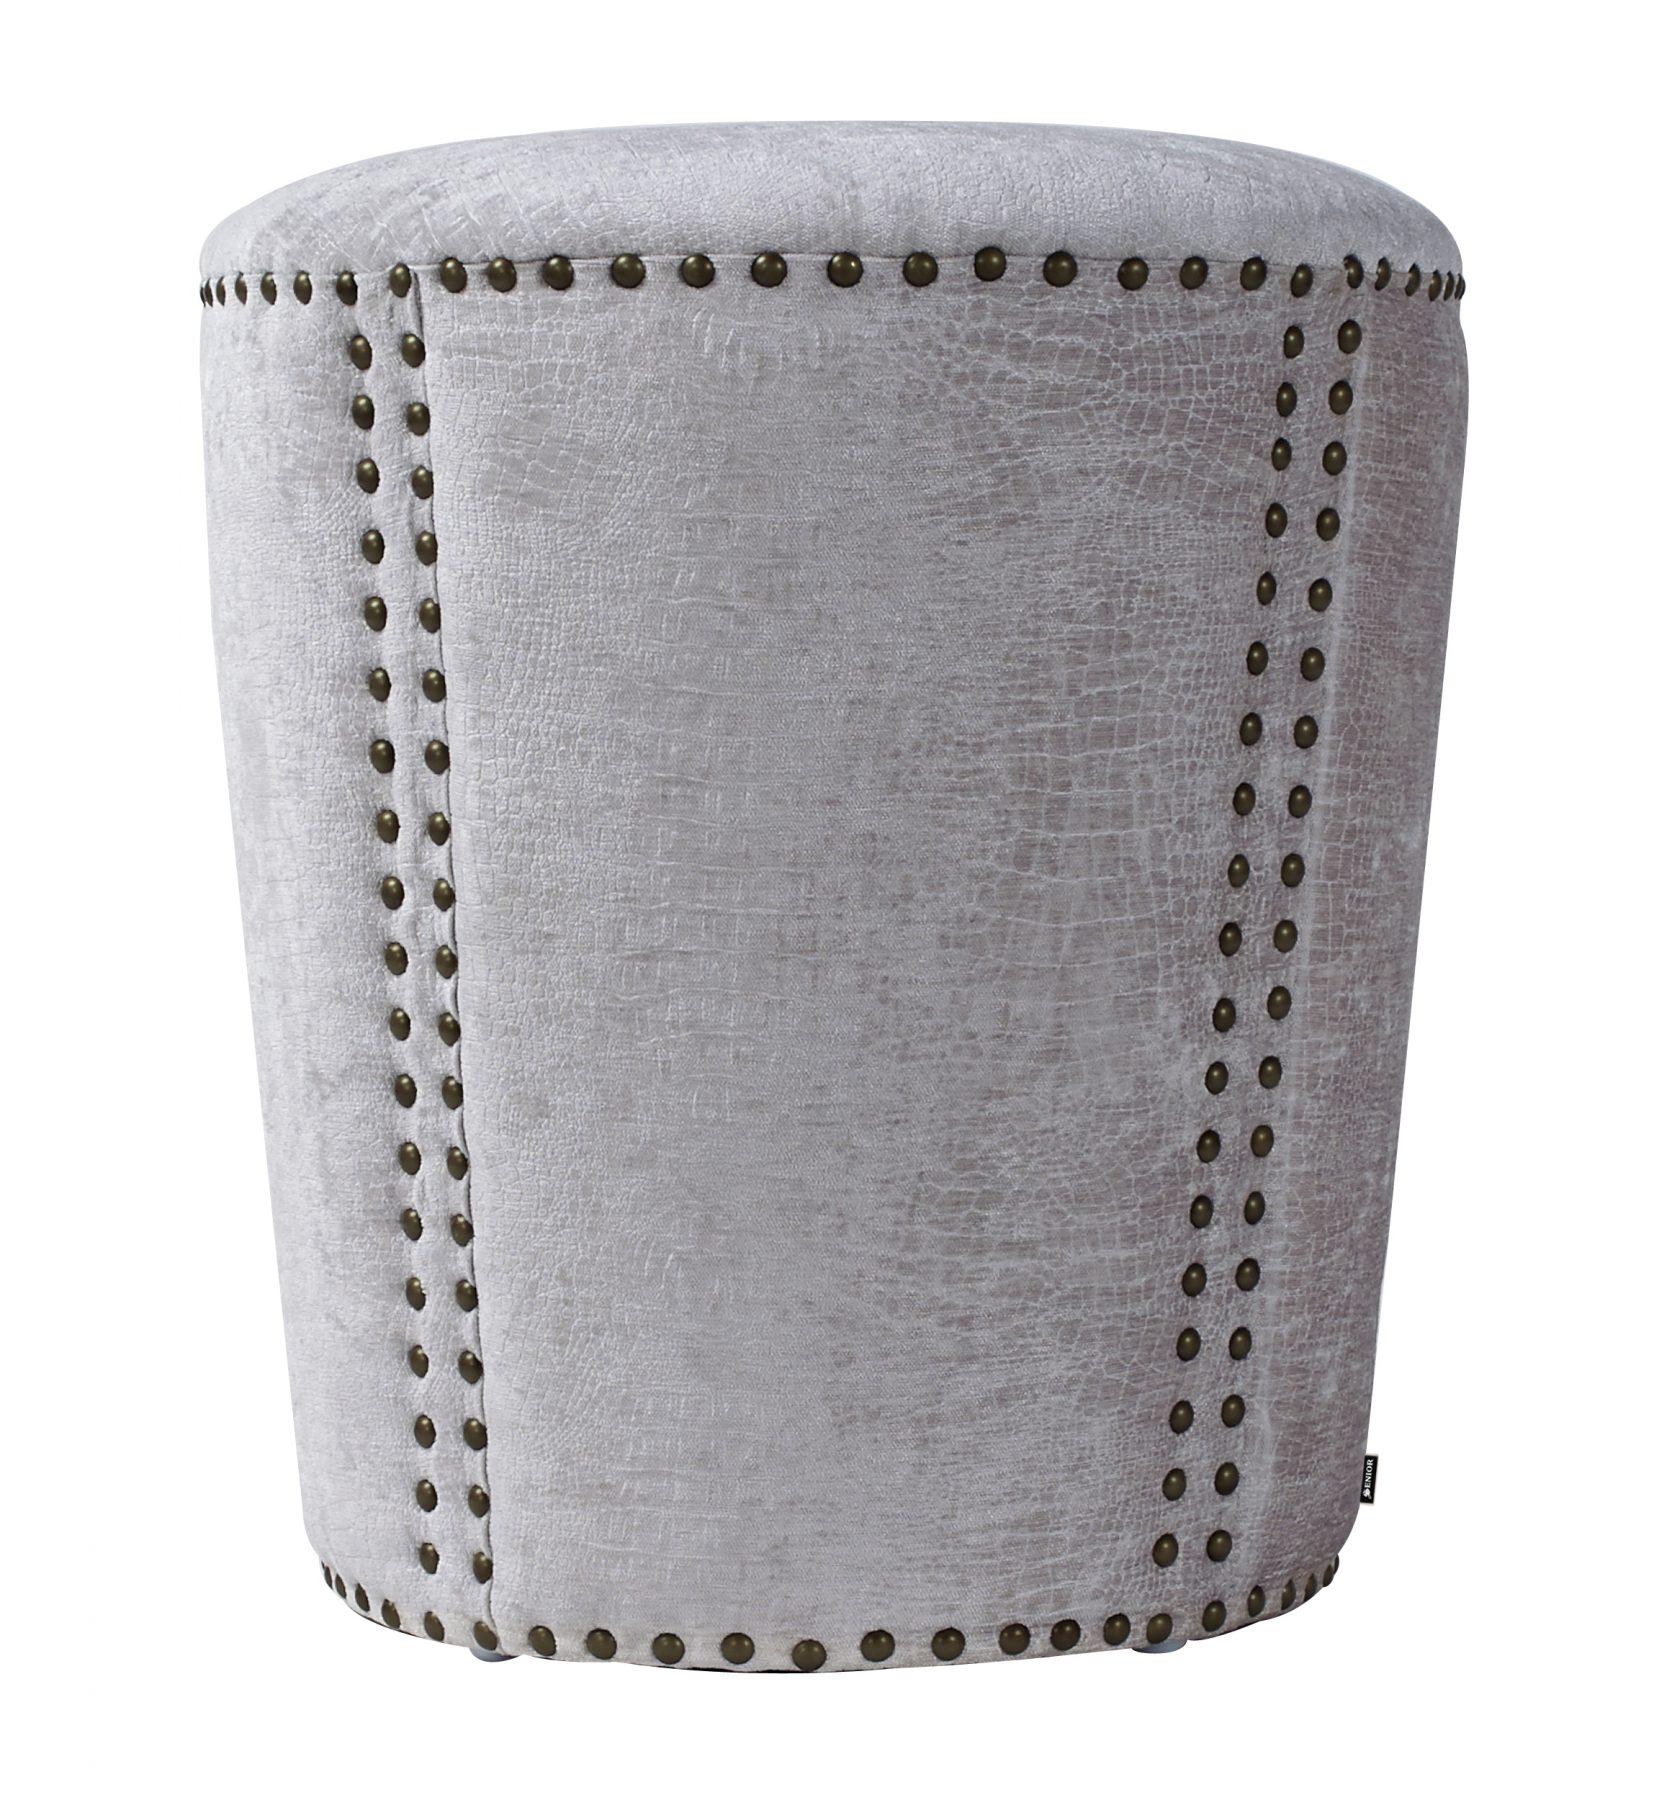 Elegant grey studded foot stool